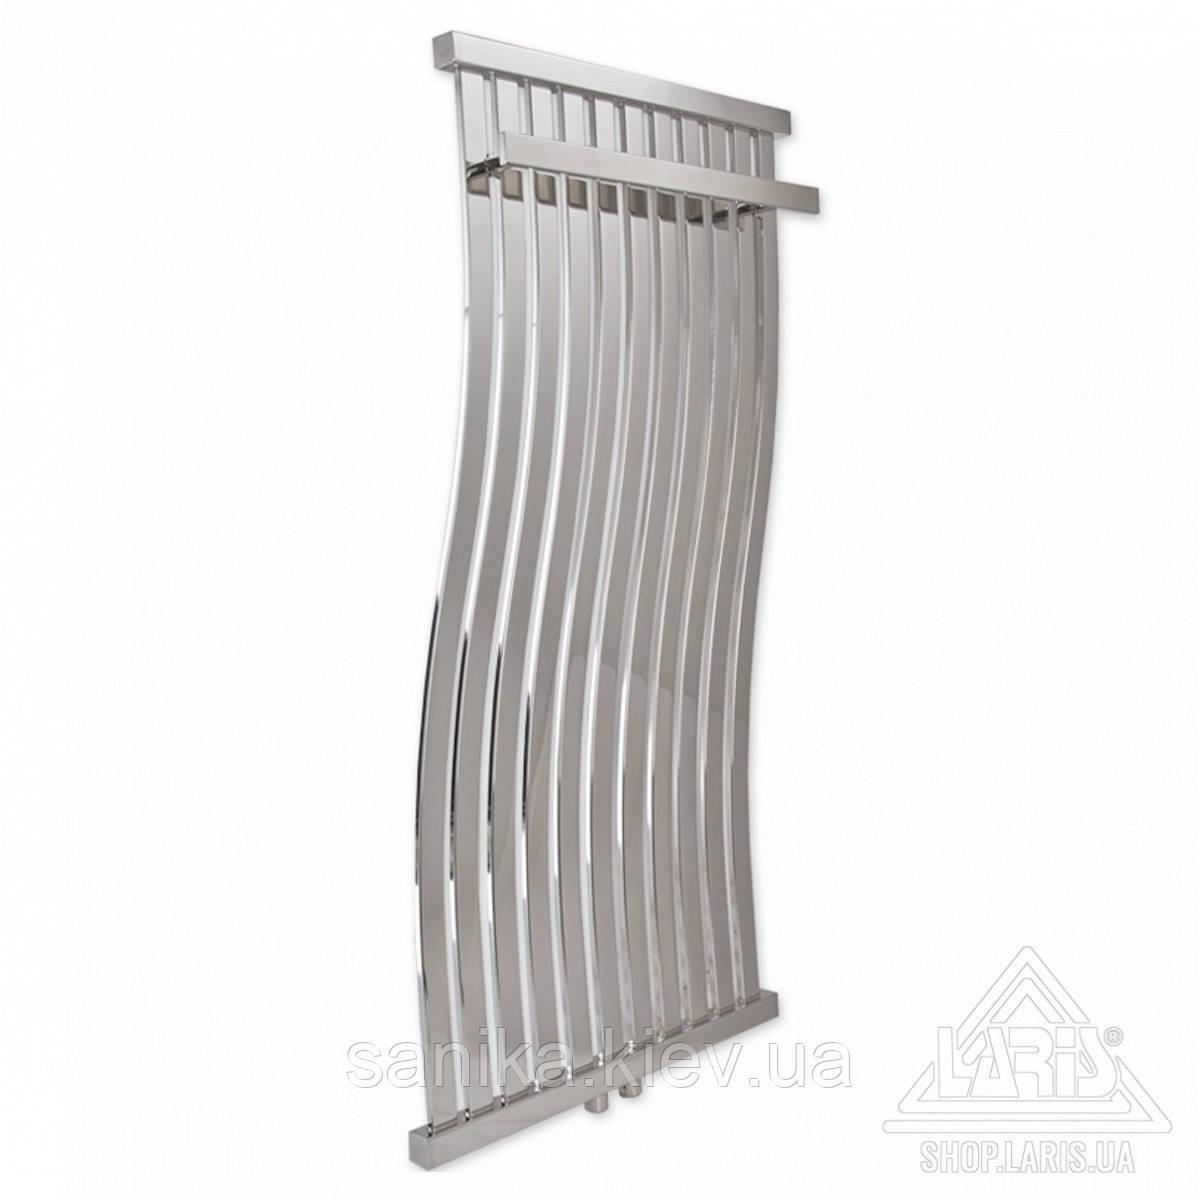 Водяной полотенцесушитель Ларис Фрирайд П11 500х1000 мм